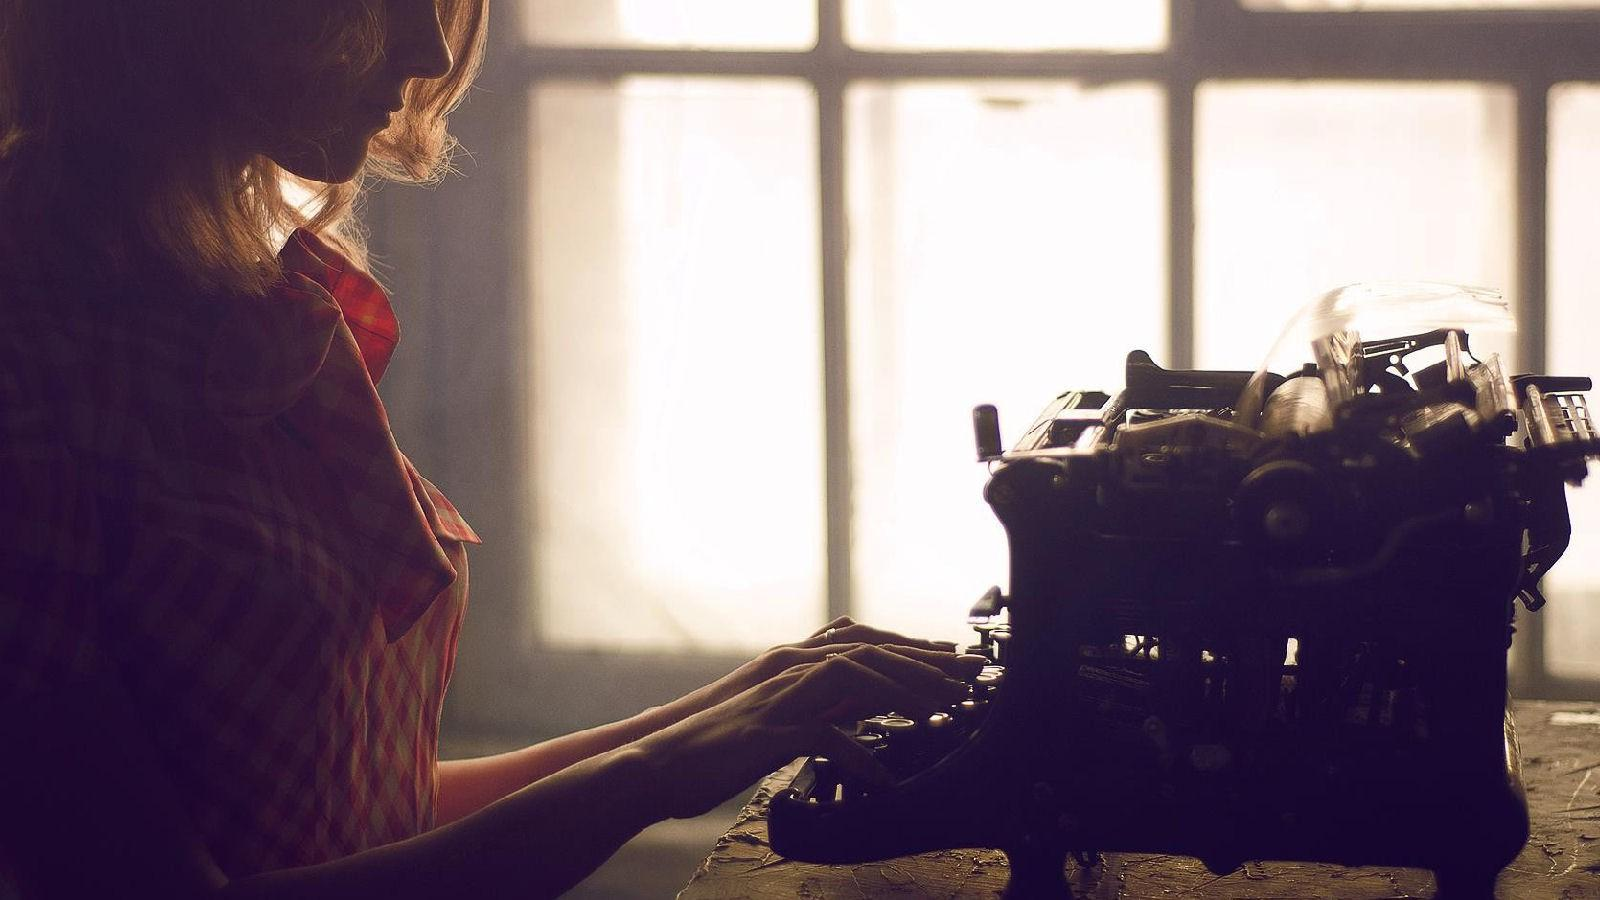 5 Good Ways to Start an Essay